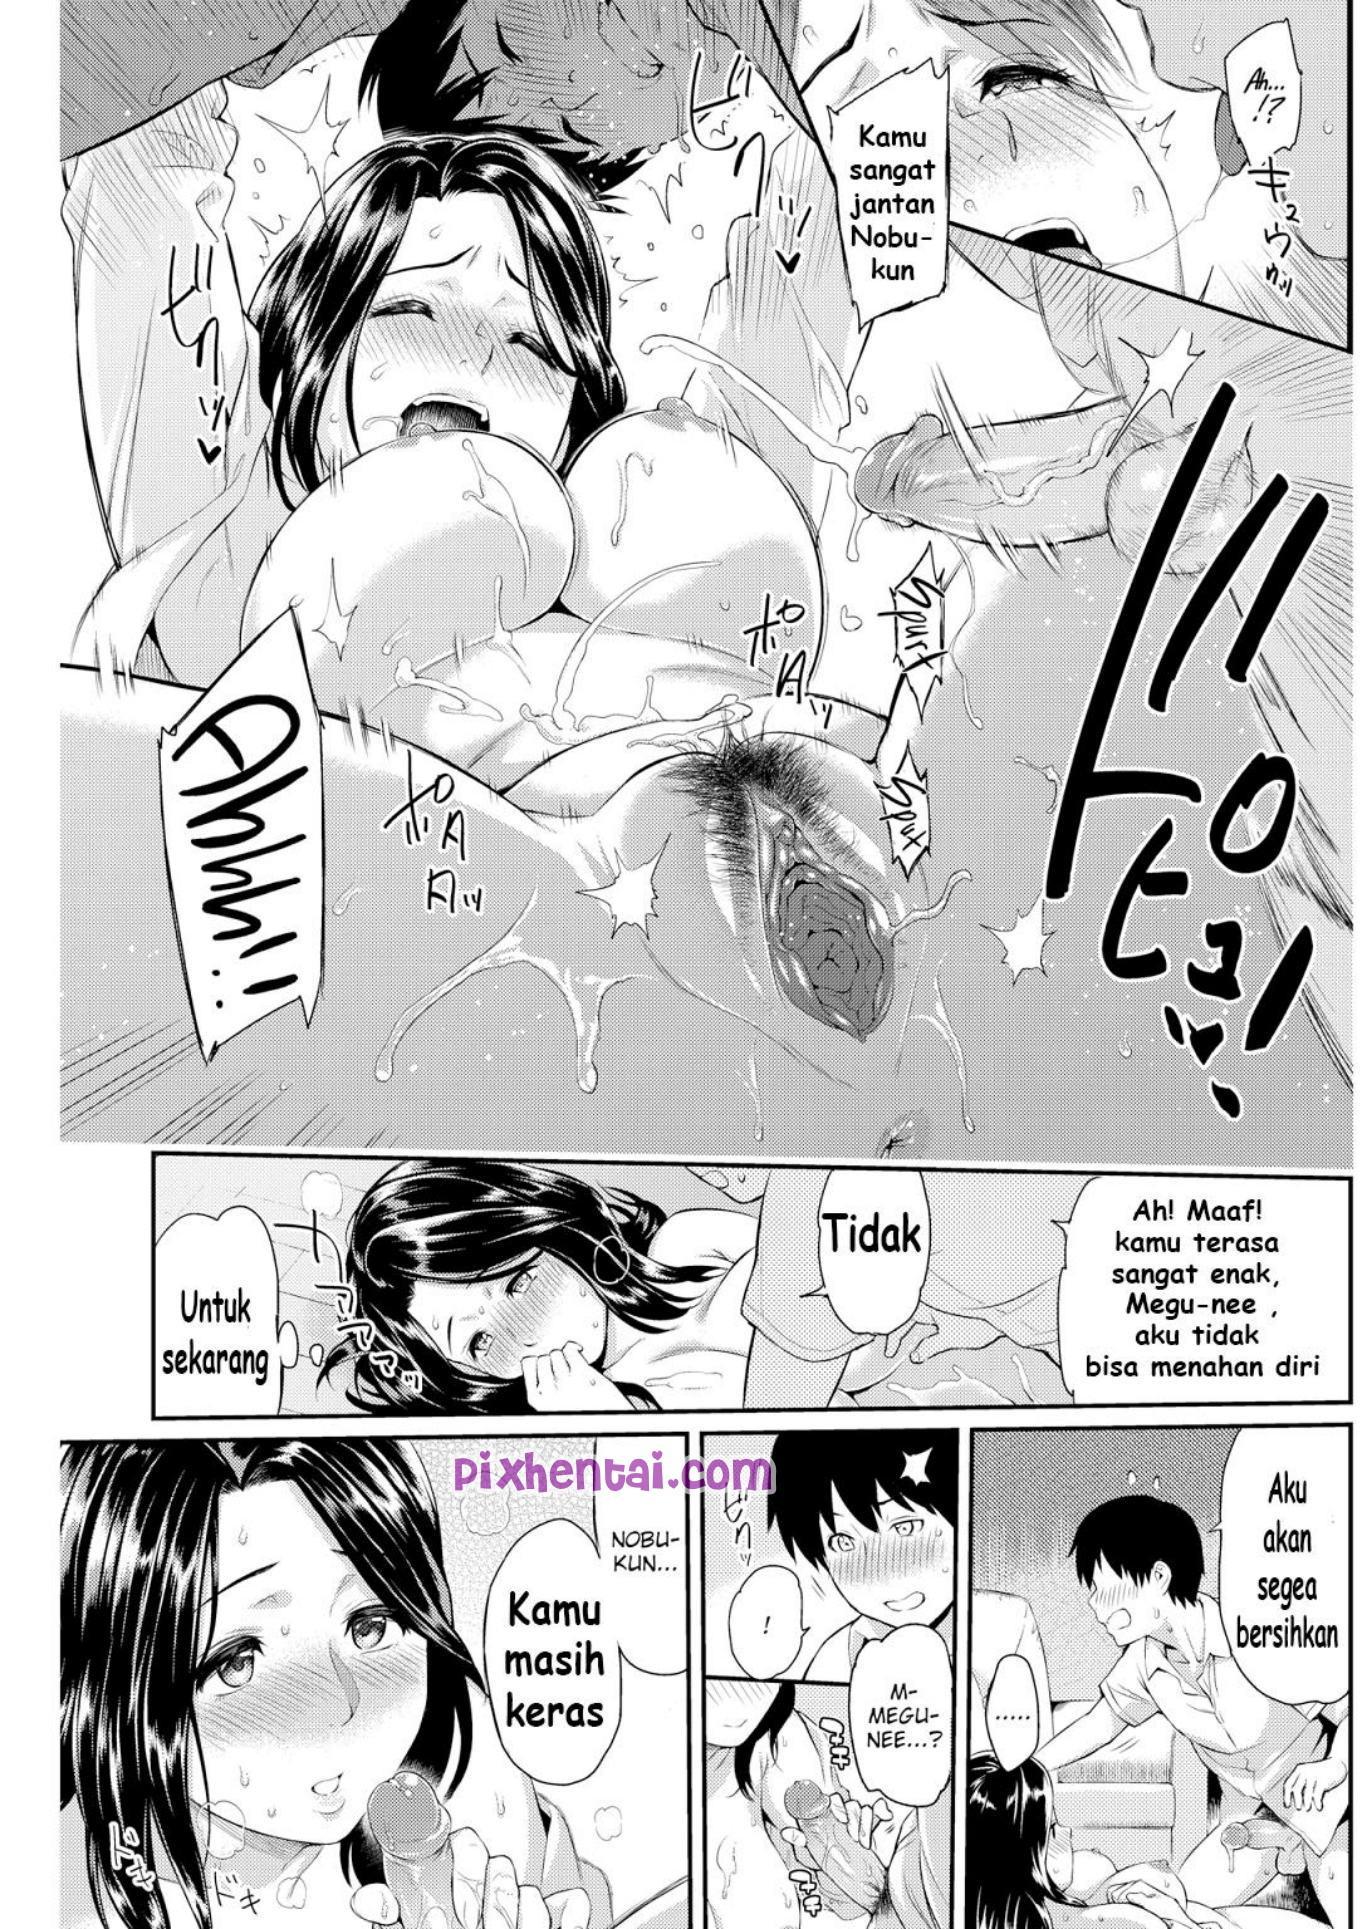 Komik Hentai Incest Sex dengan Mbak Montok Manga XXX Porn Doujin Sex Bokep 15